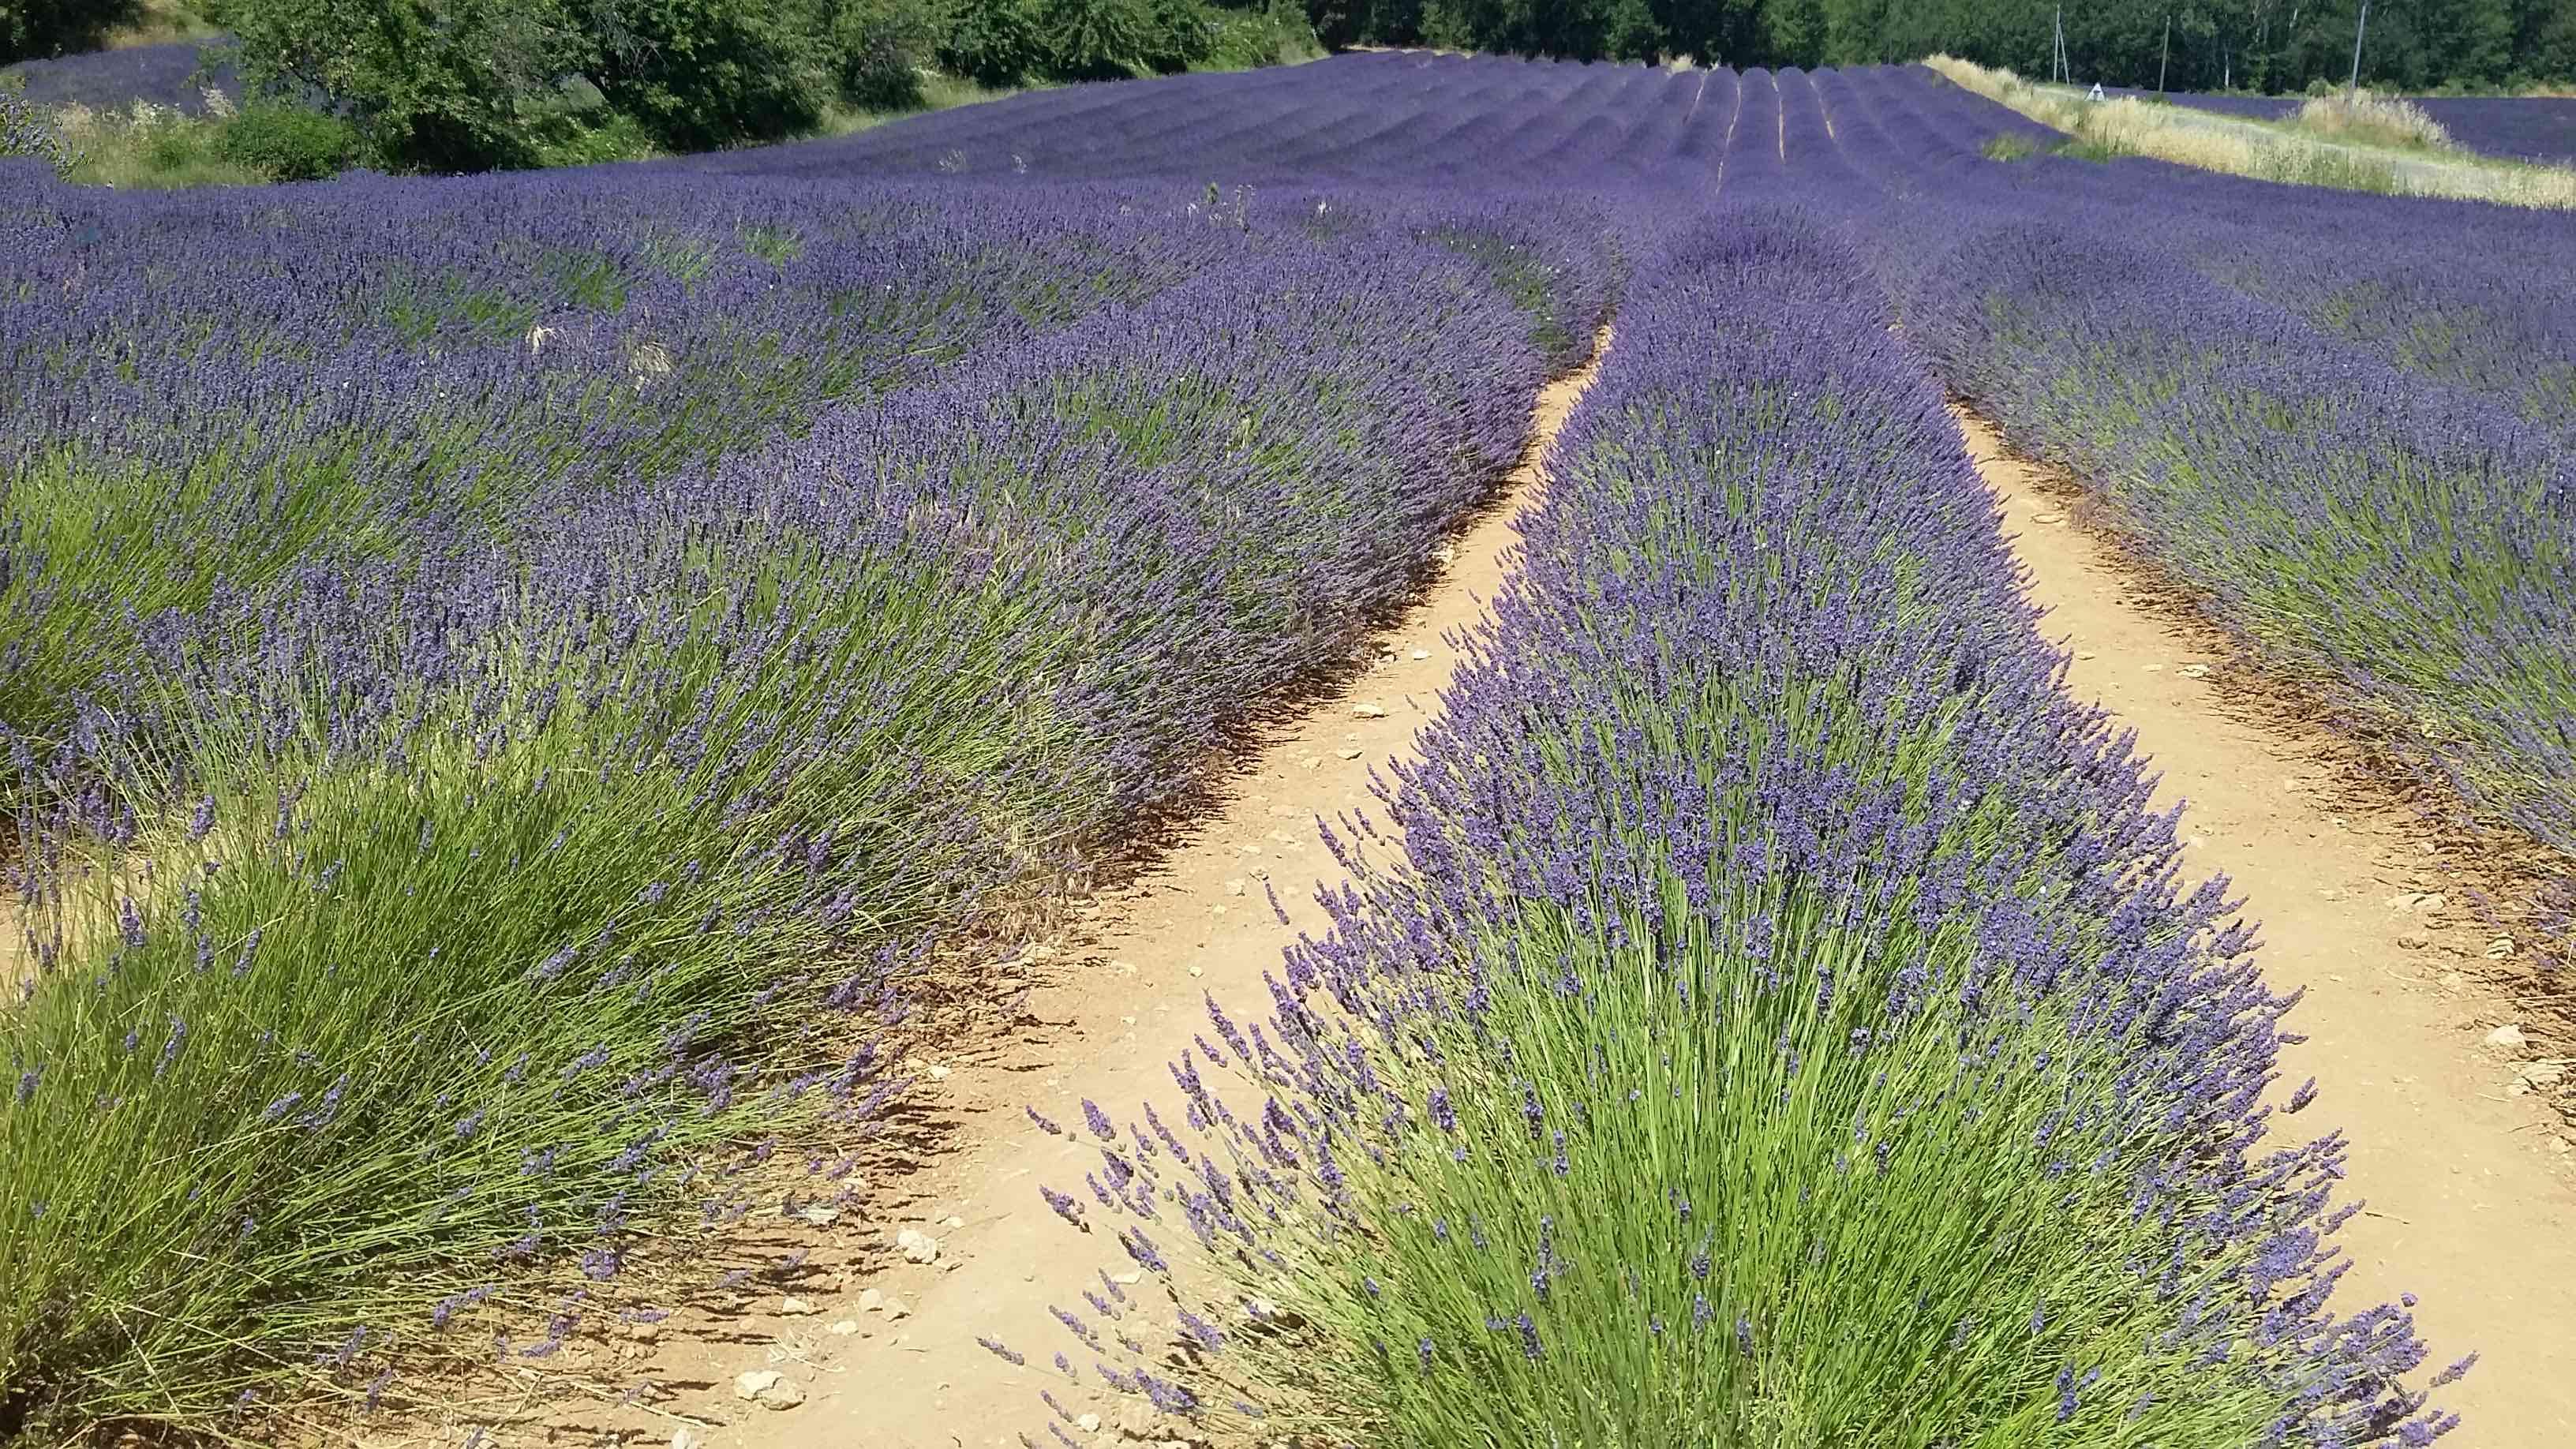 Blühendes Lavendelfeld